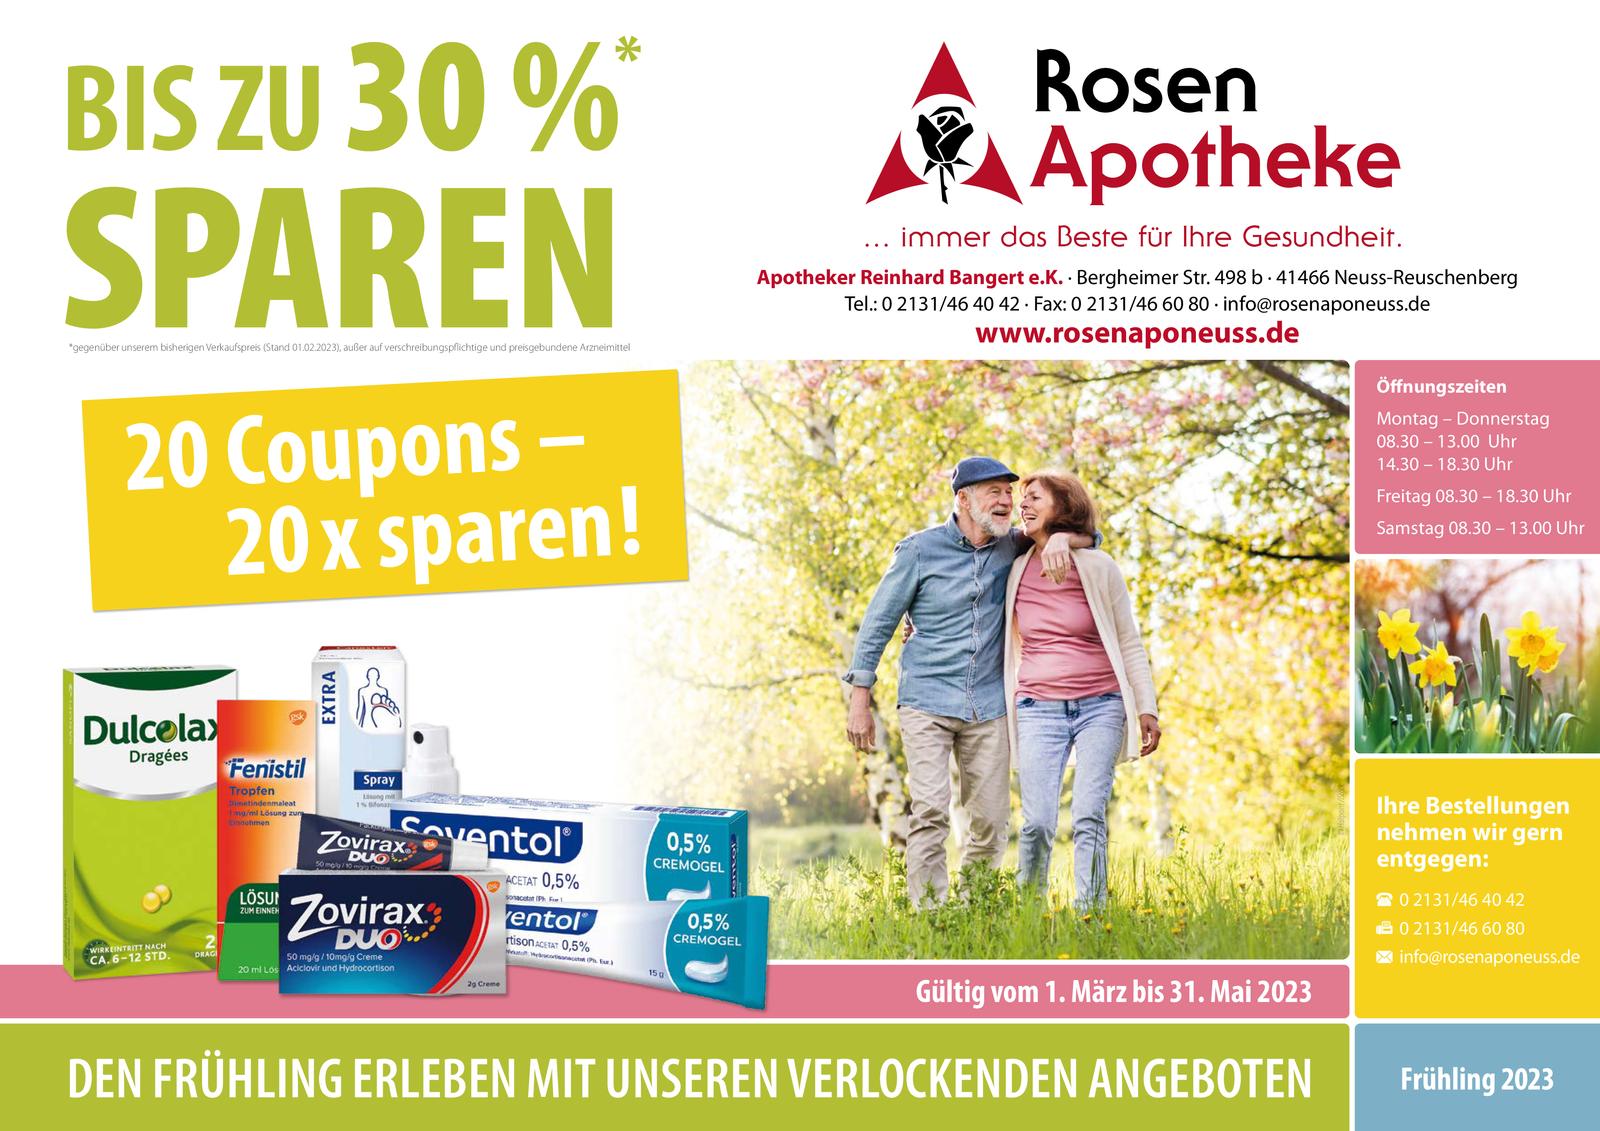 https://mein-uploads.apocdn.net/4997/leaflets/4997_flyer-Seite3.png